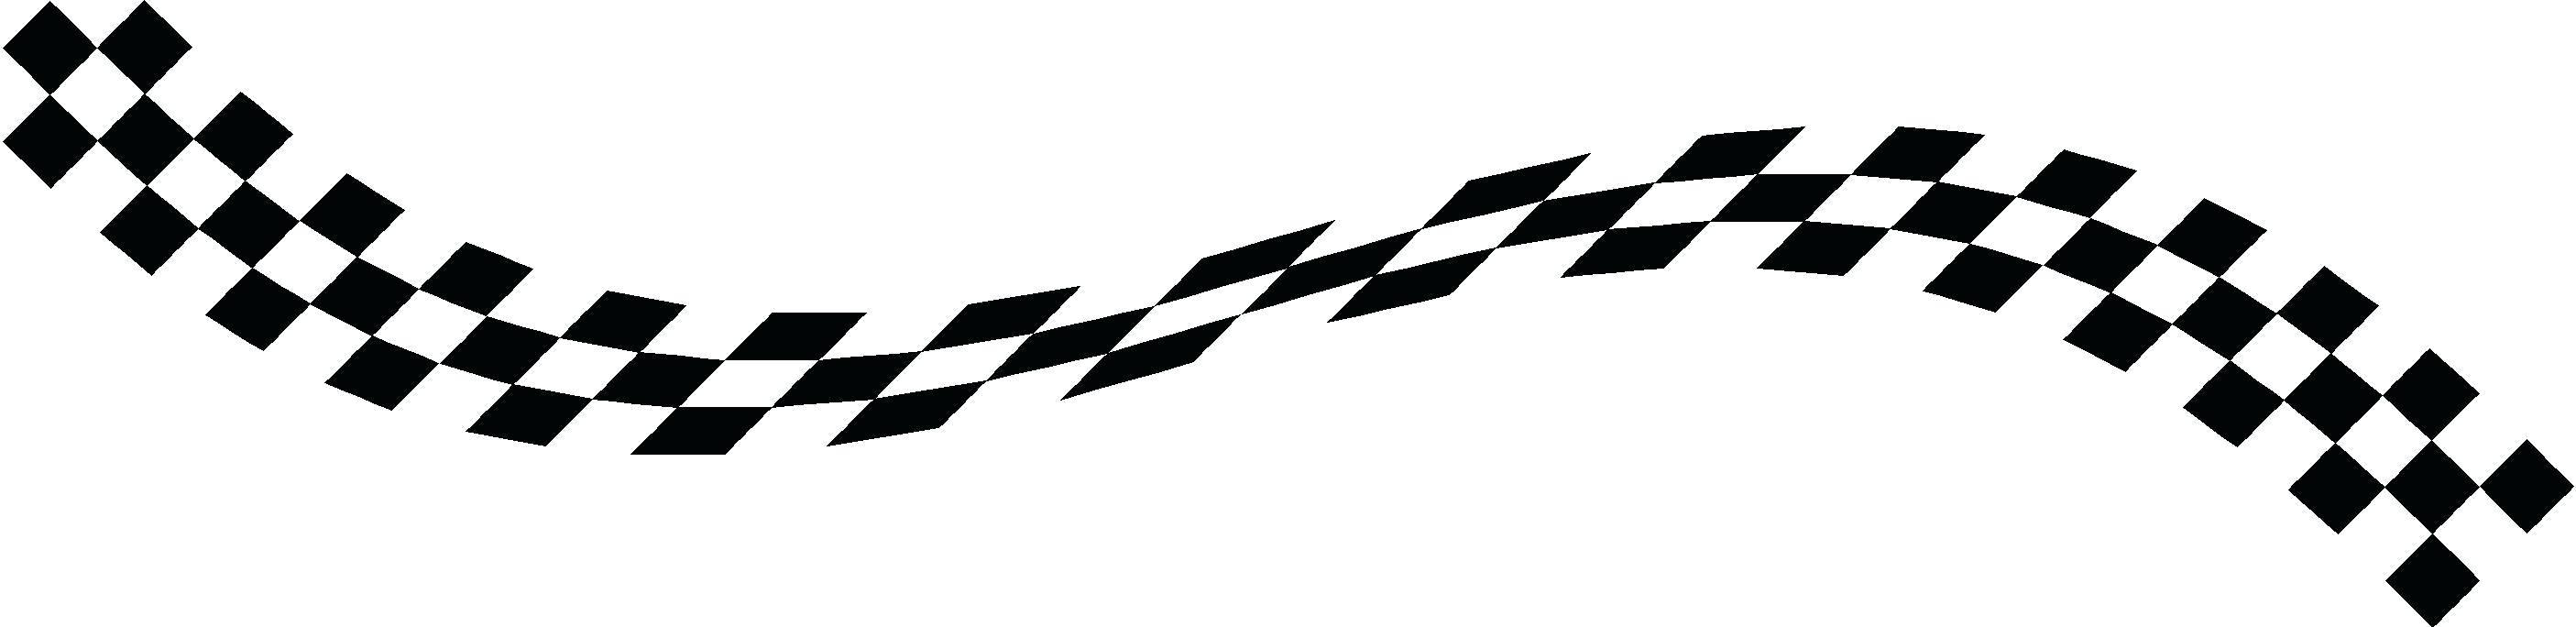 2811x684 Checkered Wallpaper Border Flag Decal Race Car Wall Racing Decor